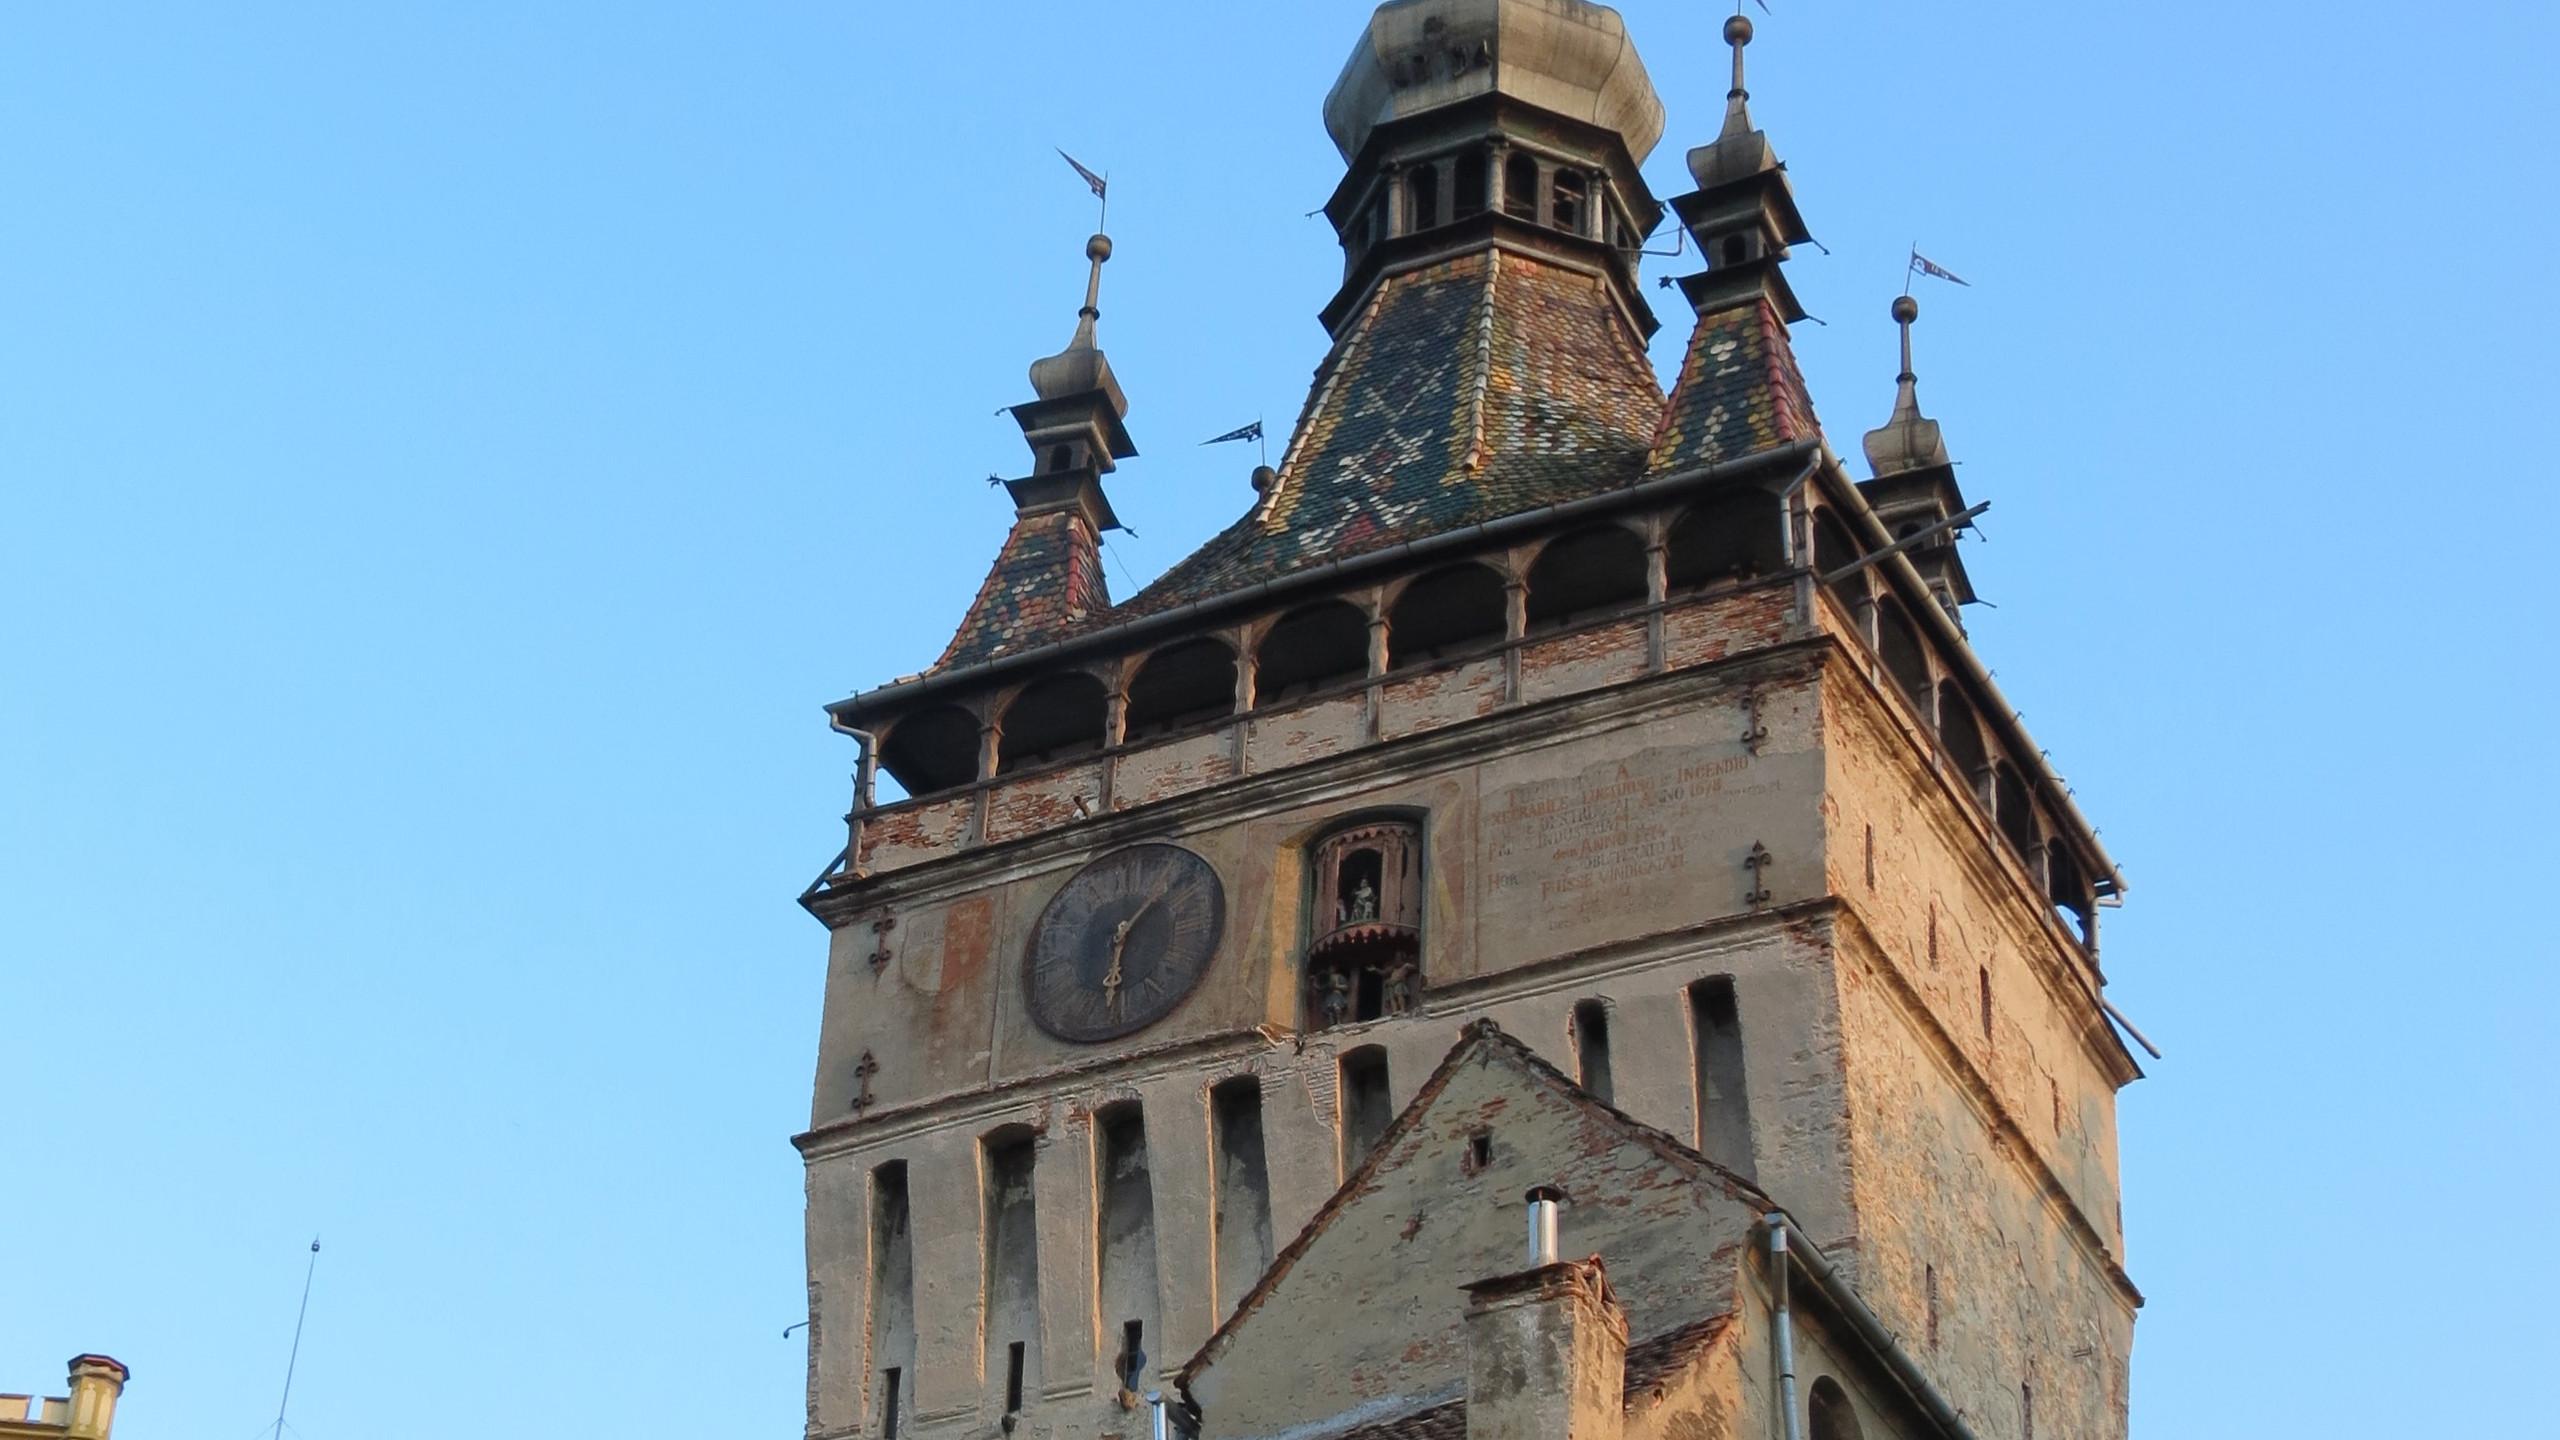 058_-_Clock_tower,_Sighișoara